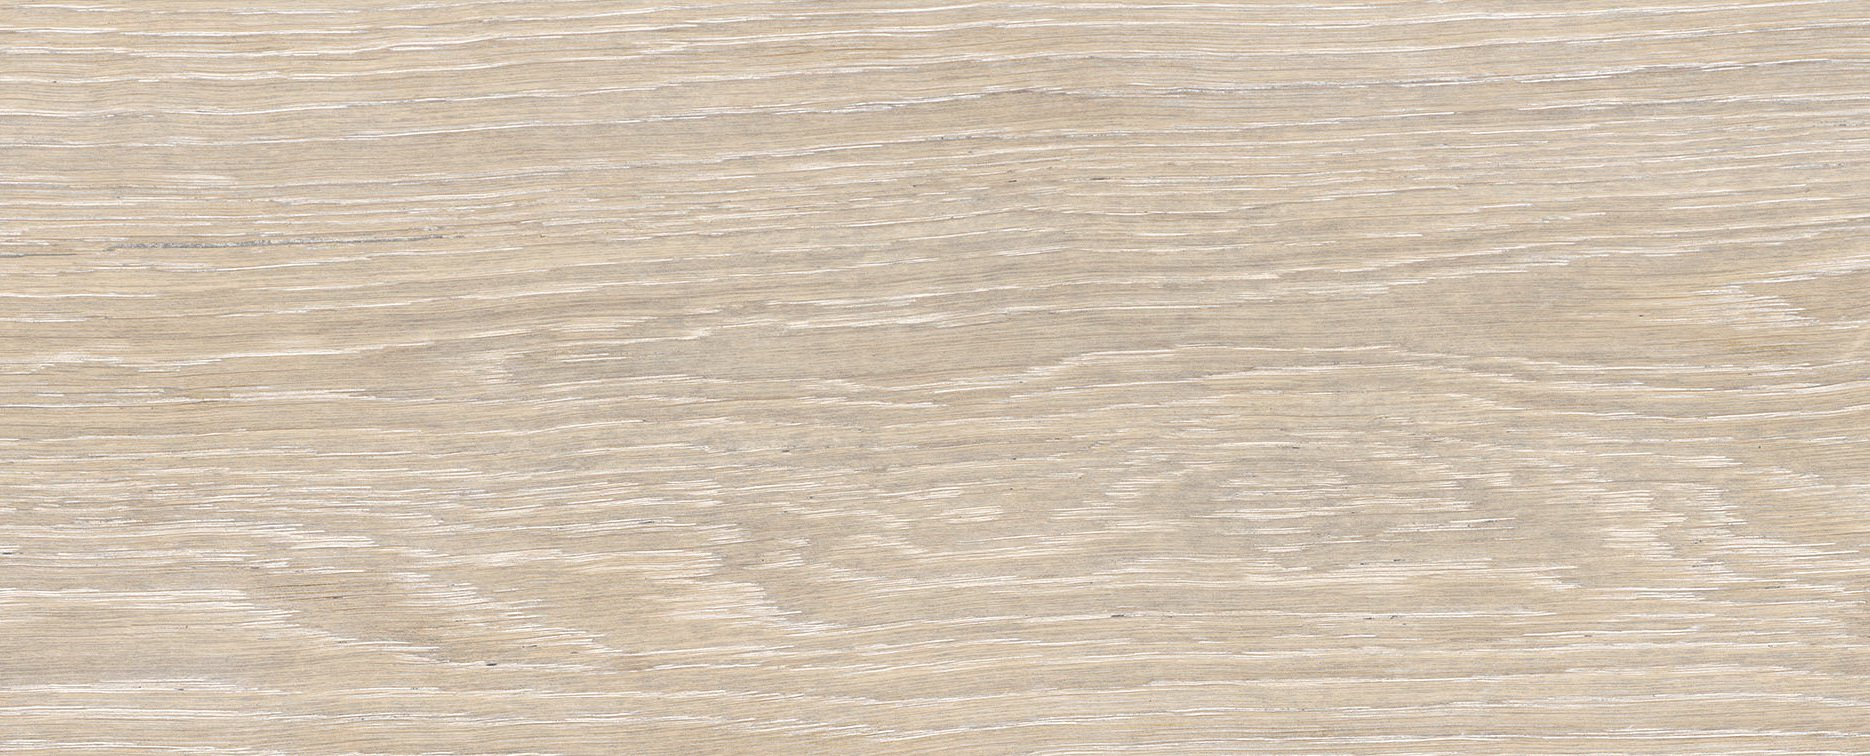 Пробковое покрытие Granorte Oak Seashell